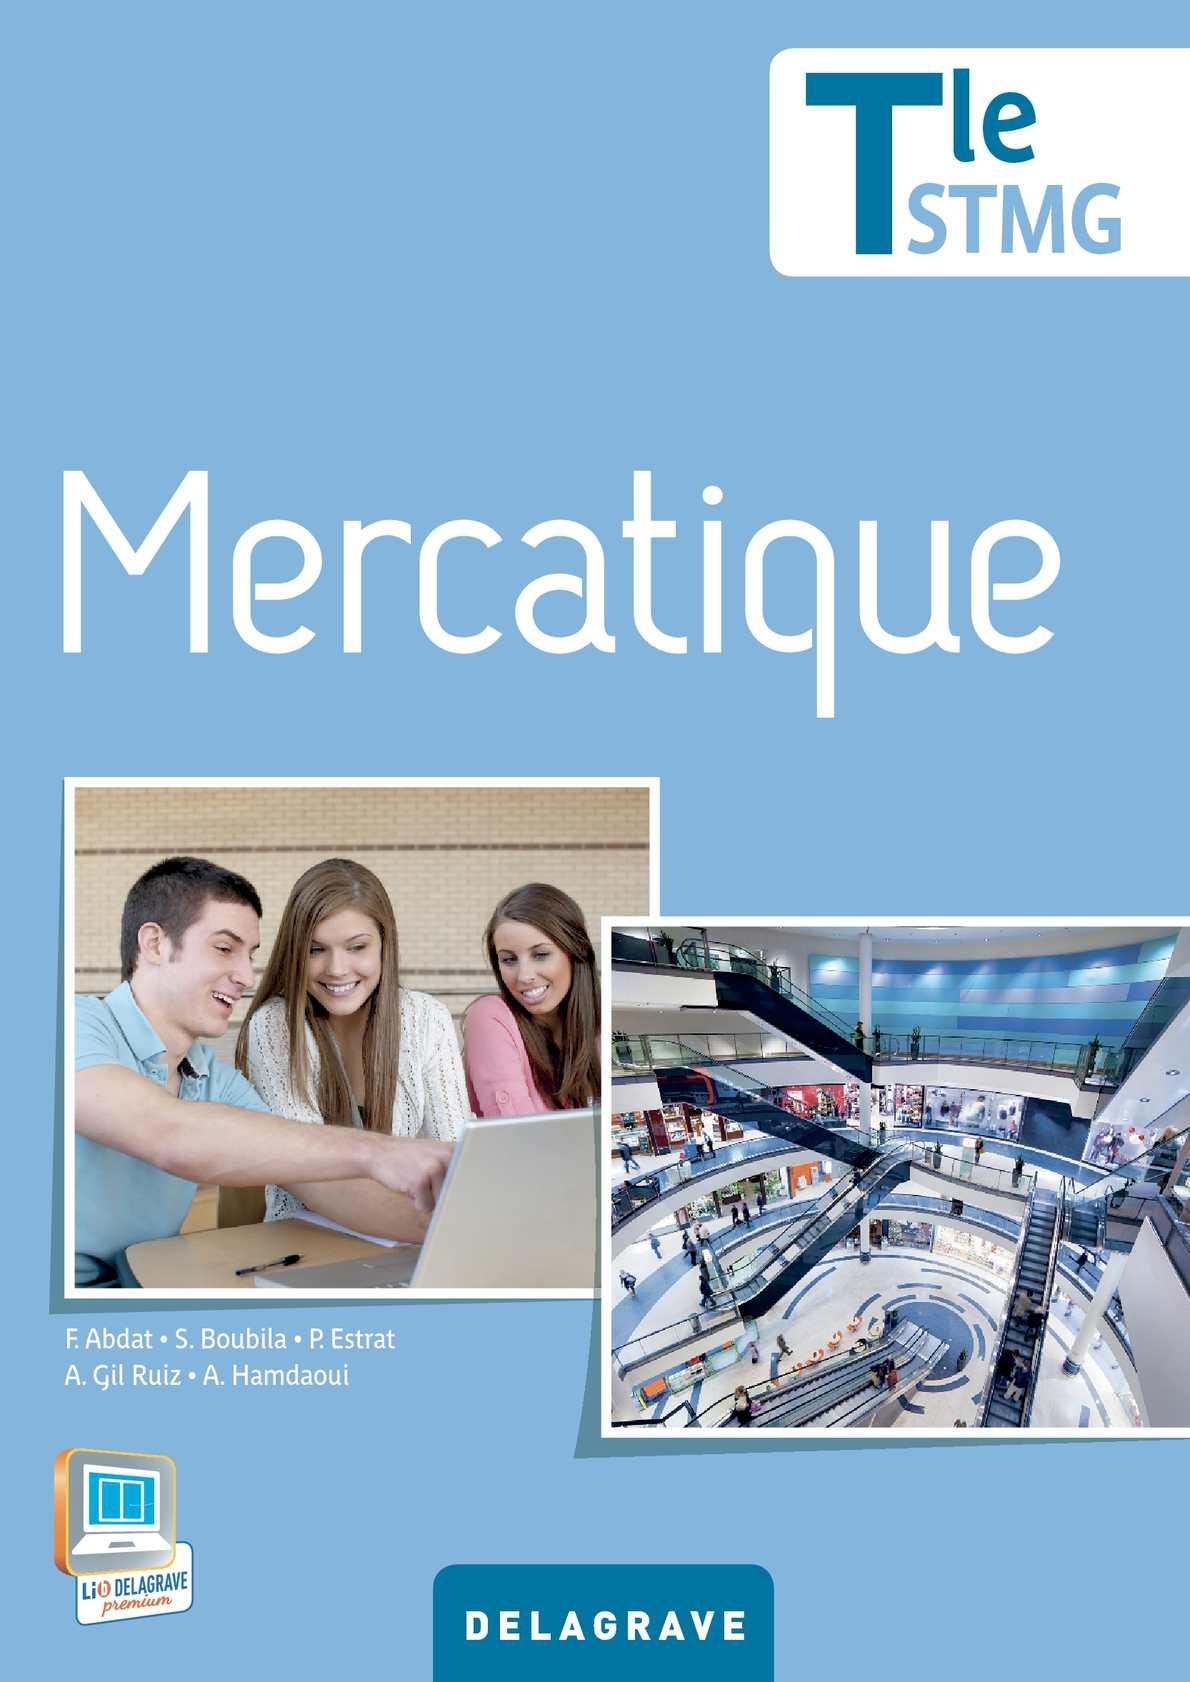 2013 - Extraits Mercatique Tle STMG